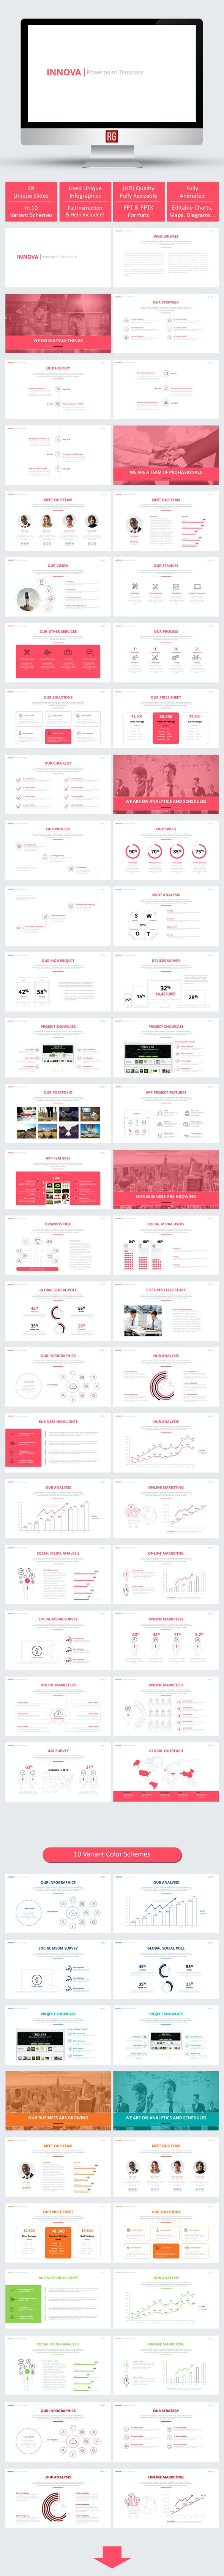 Innova Powerpoint Template - Business PowerPoint Templates